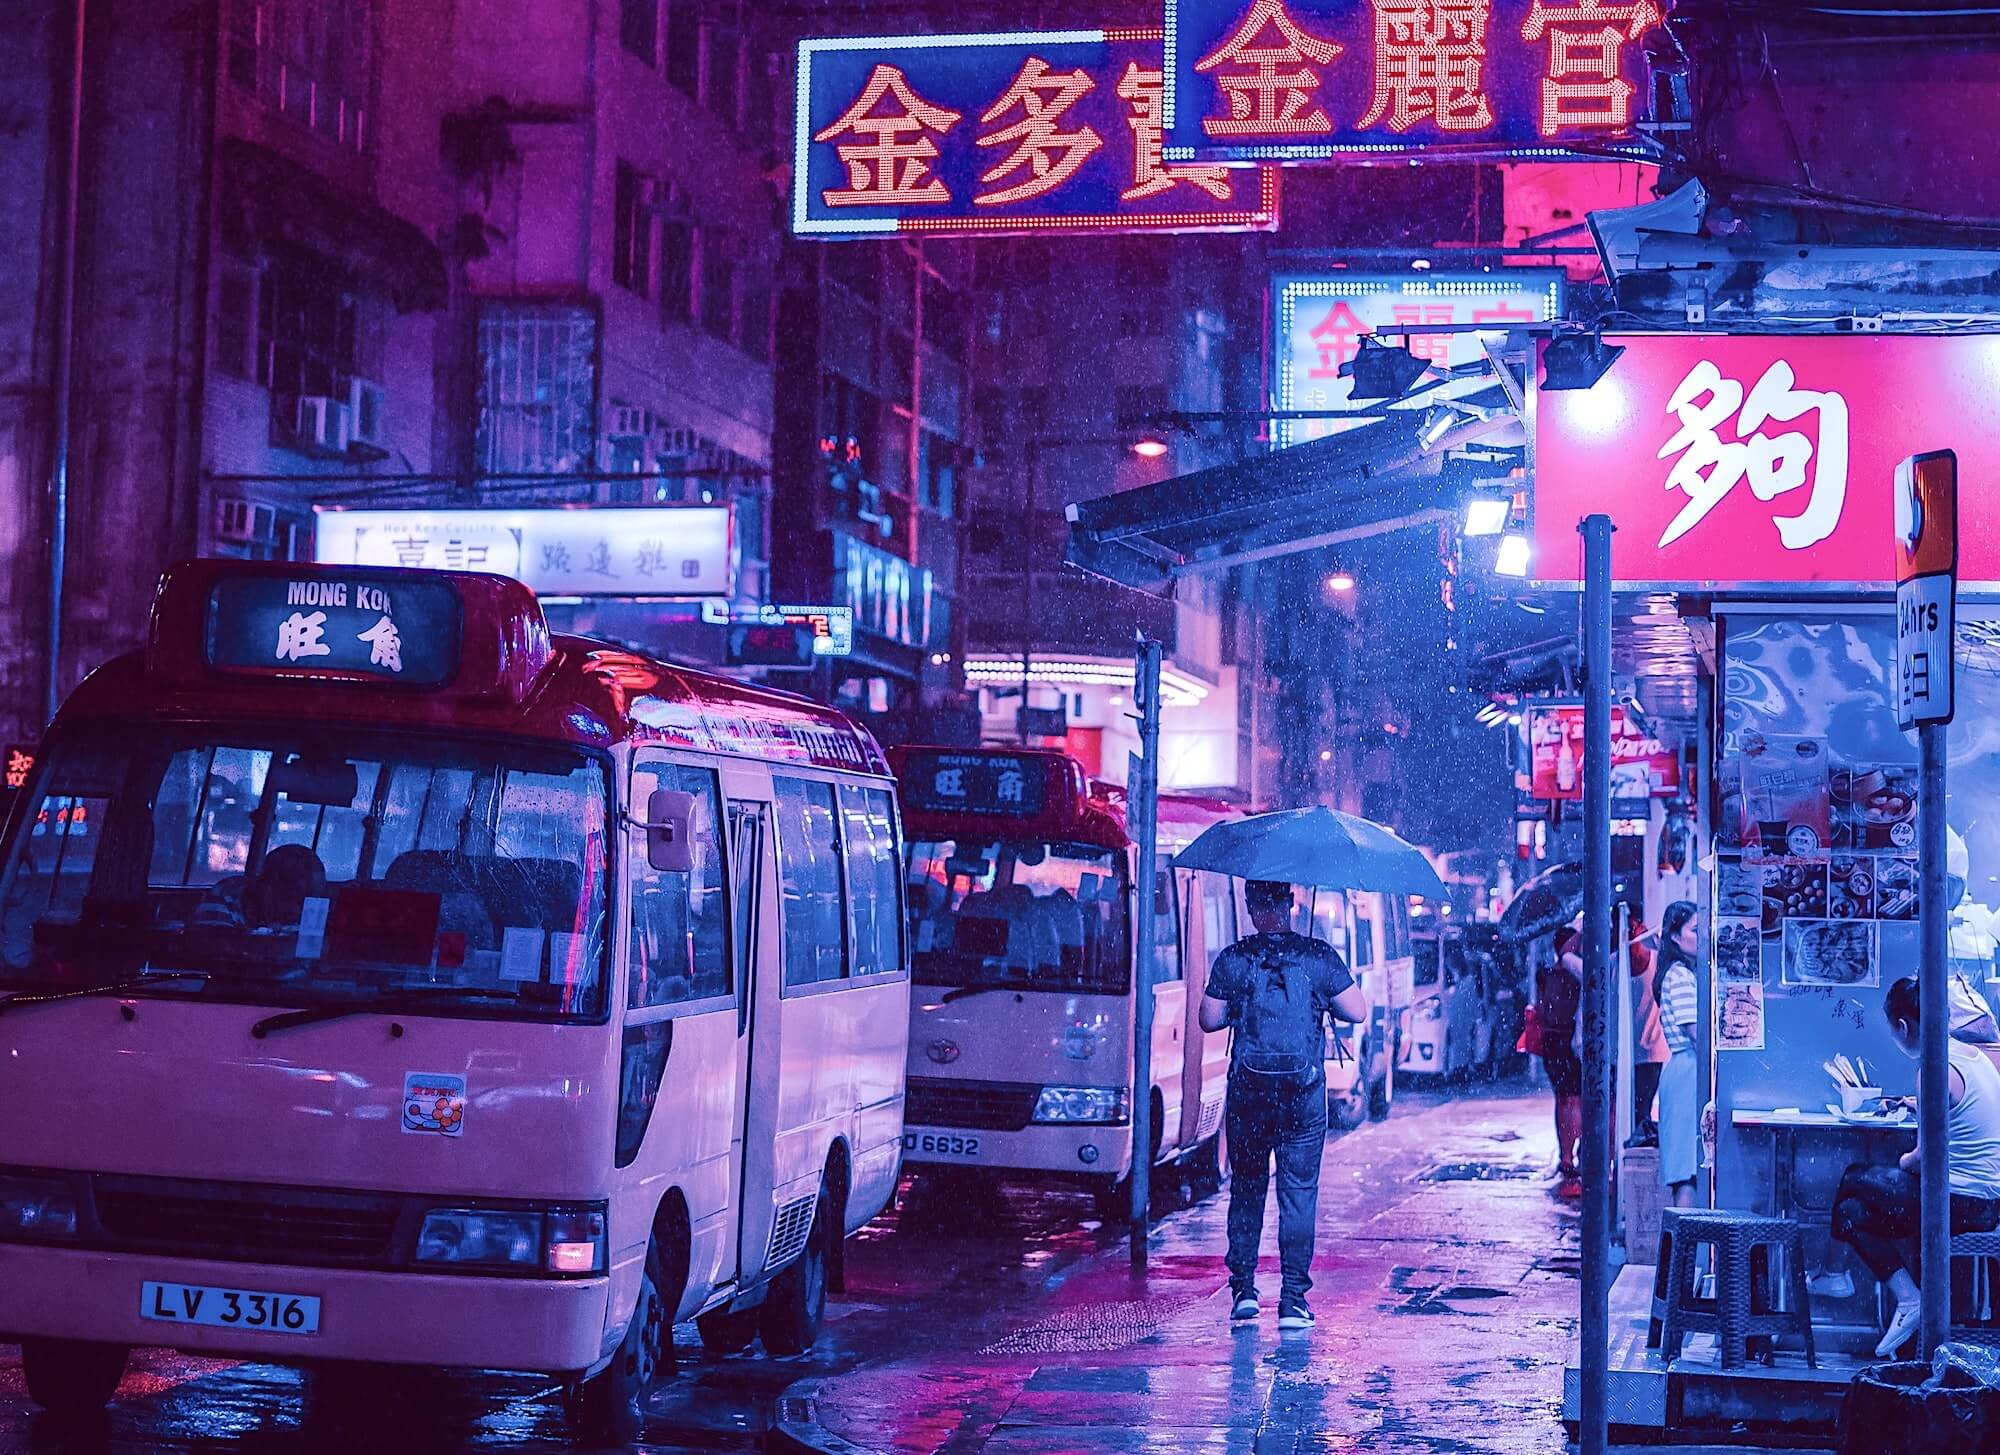 «Музыка Большого Брата»: металл, китайский поп и опера